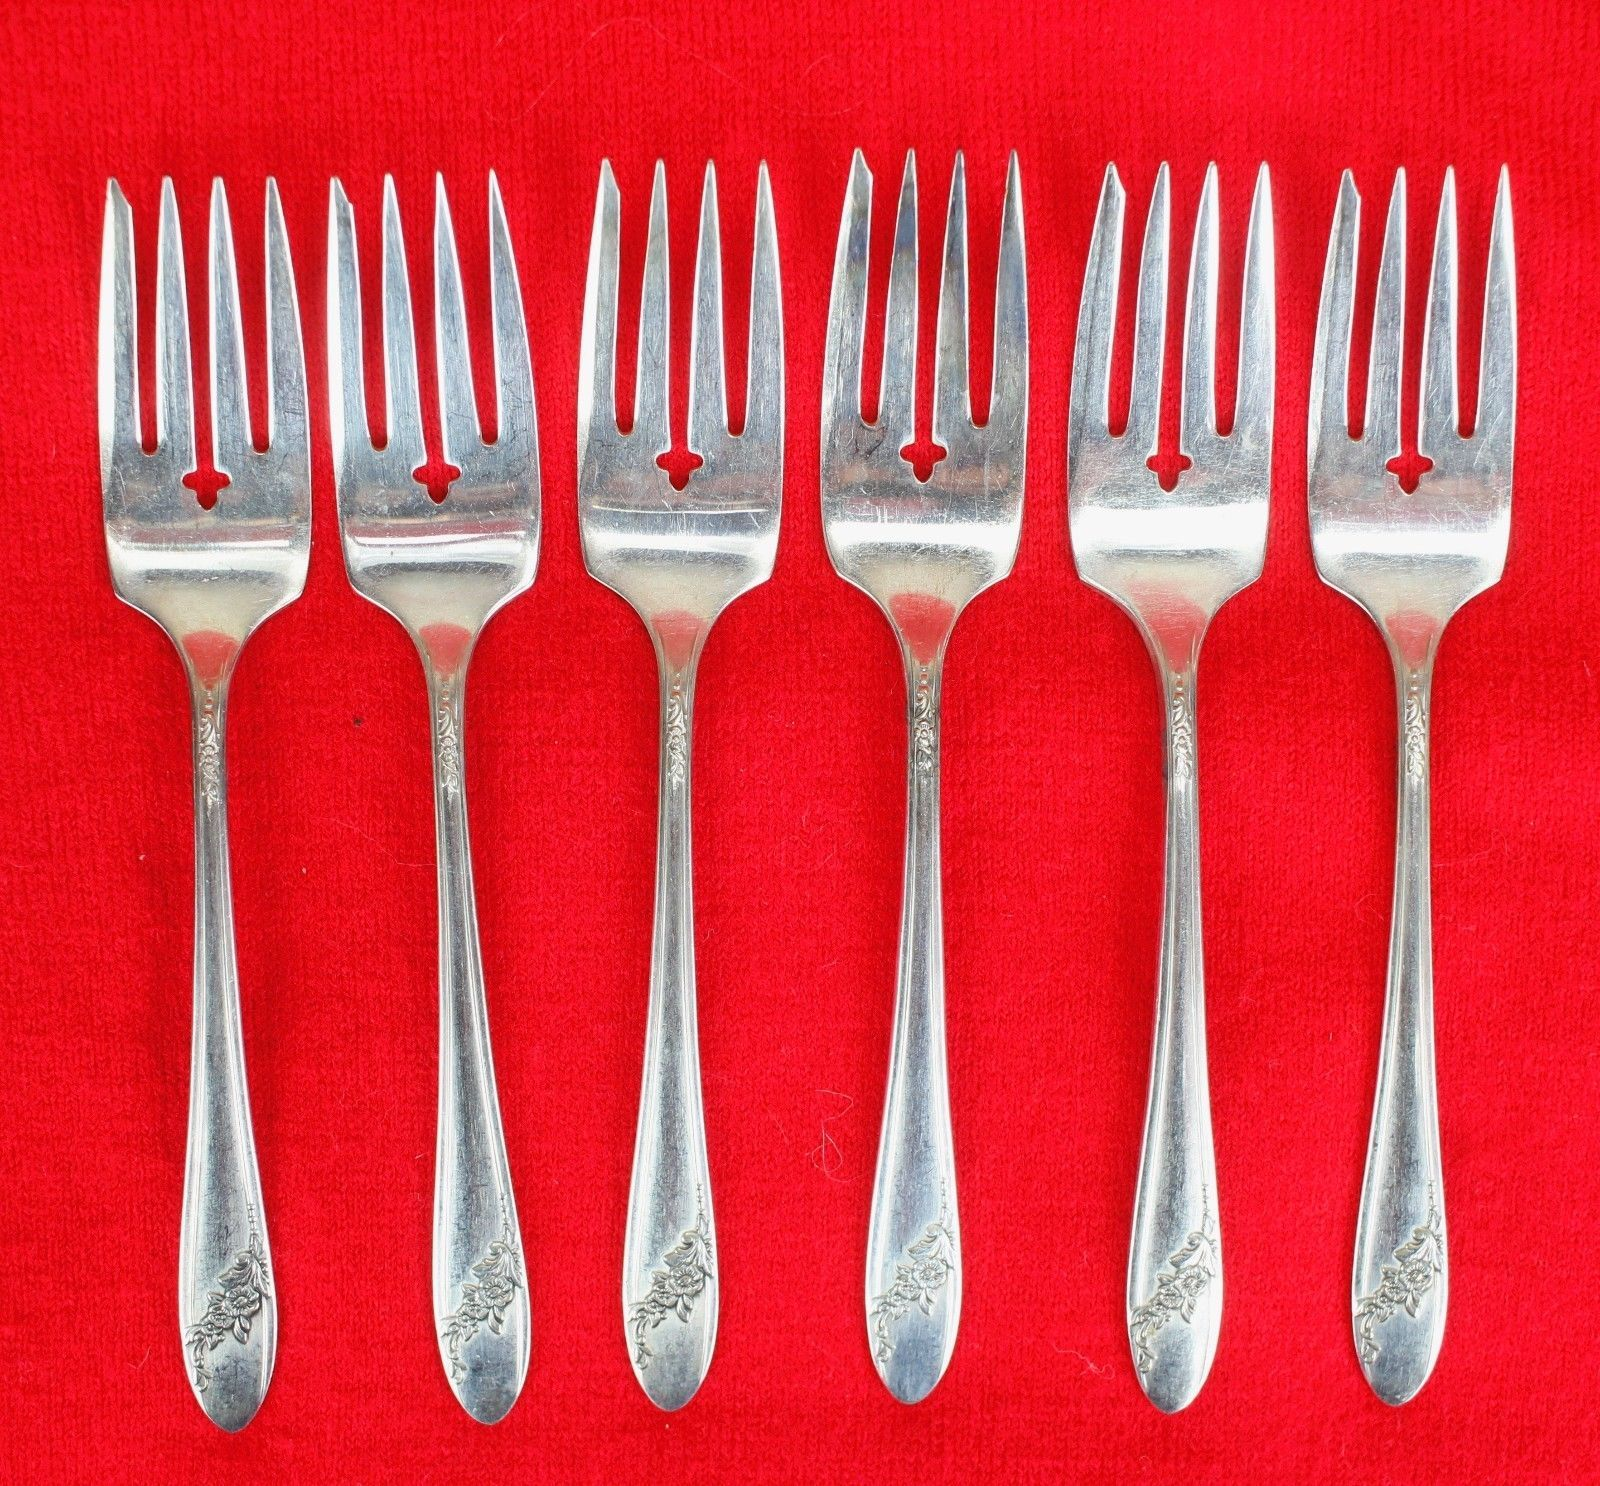 6X Salad / Dessert Forks Oneida Queen Bess II Silverplate 1946 Tudor Flatware